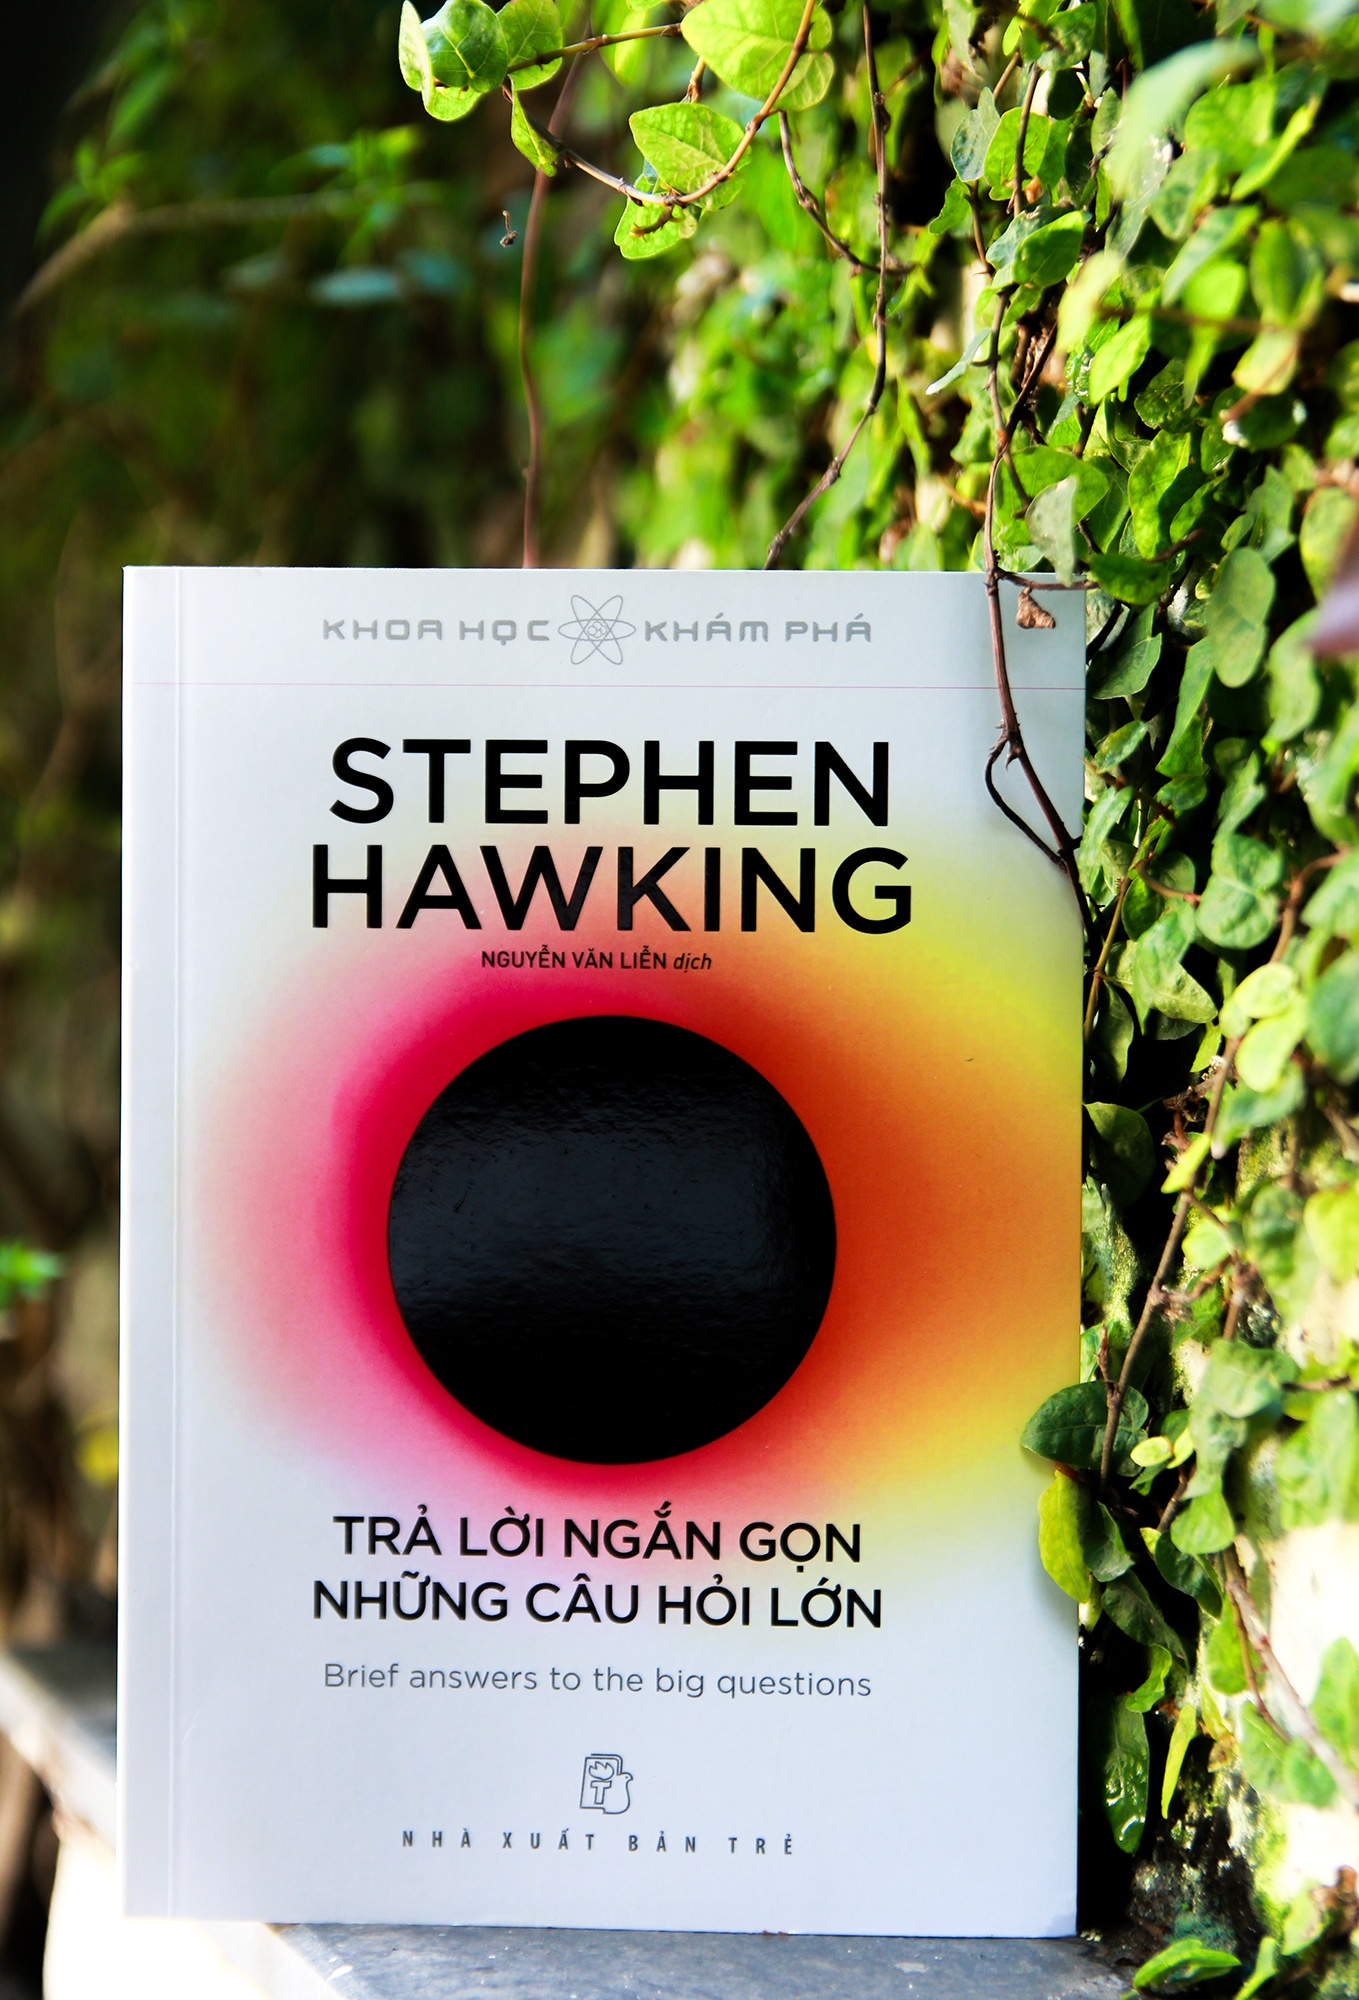 Cuon sach cuoi cua Stephen Hawking anh 2